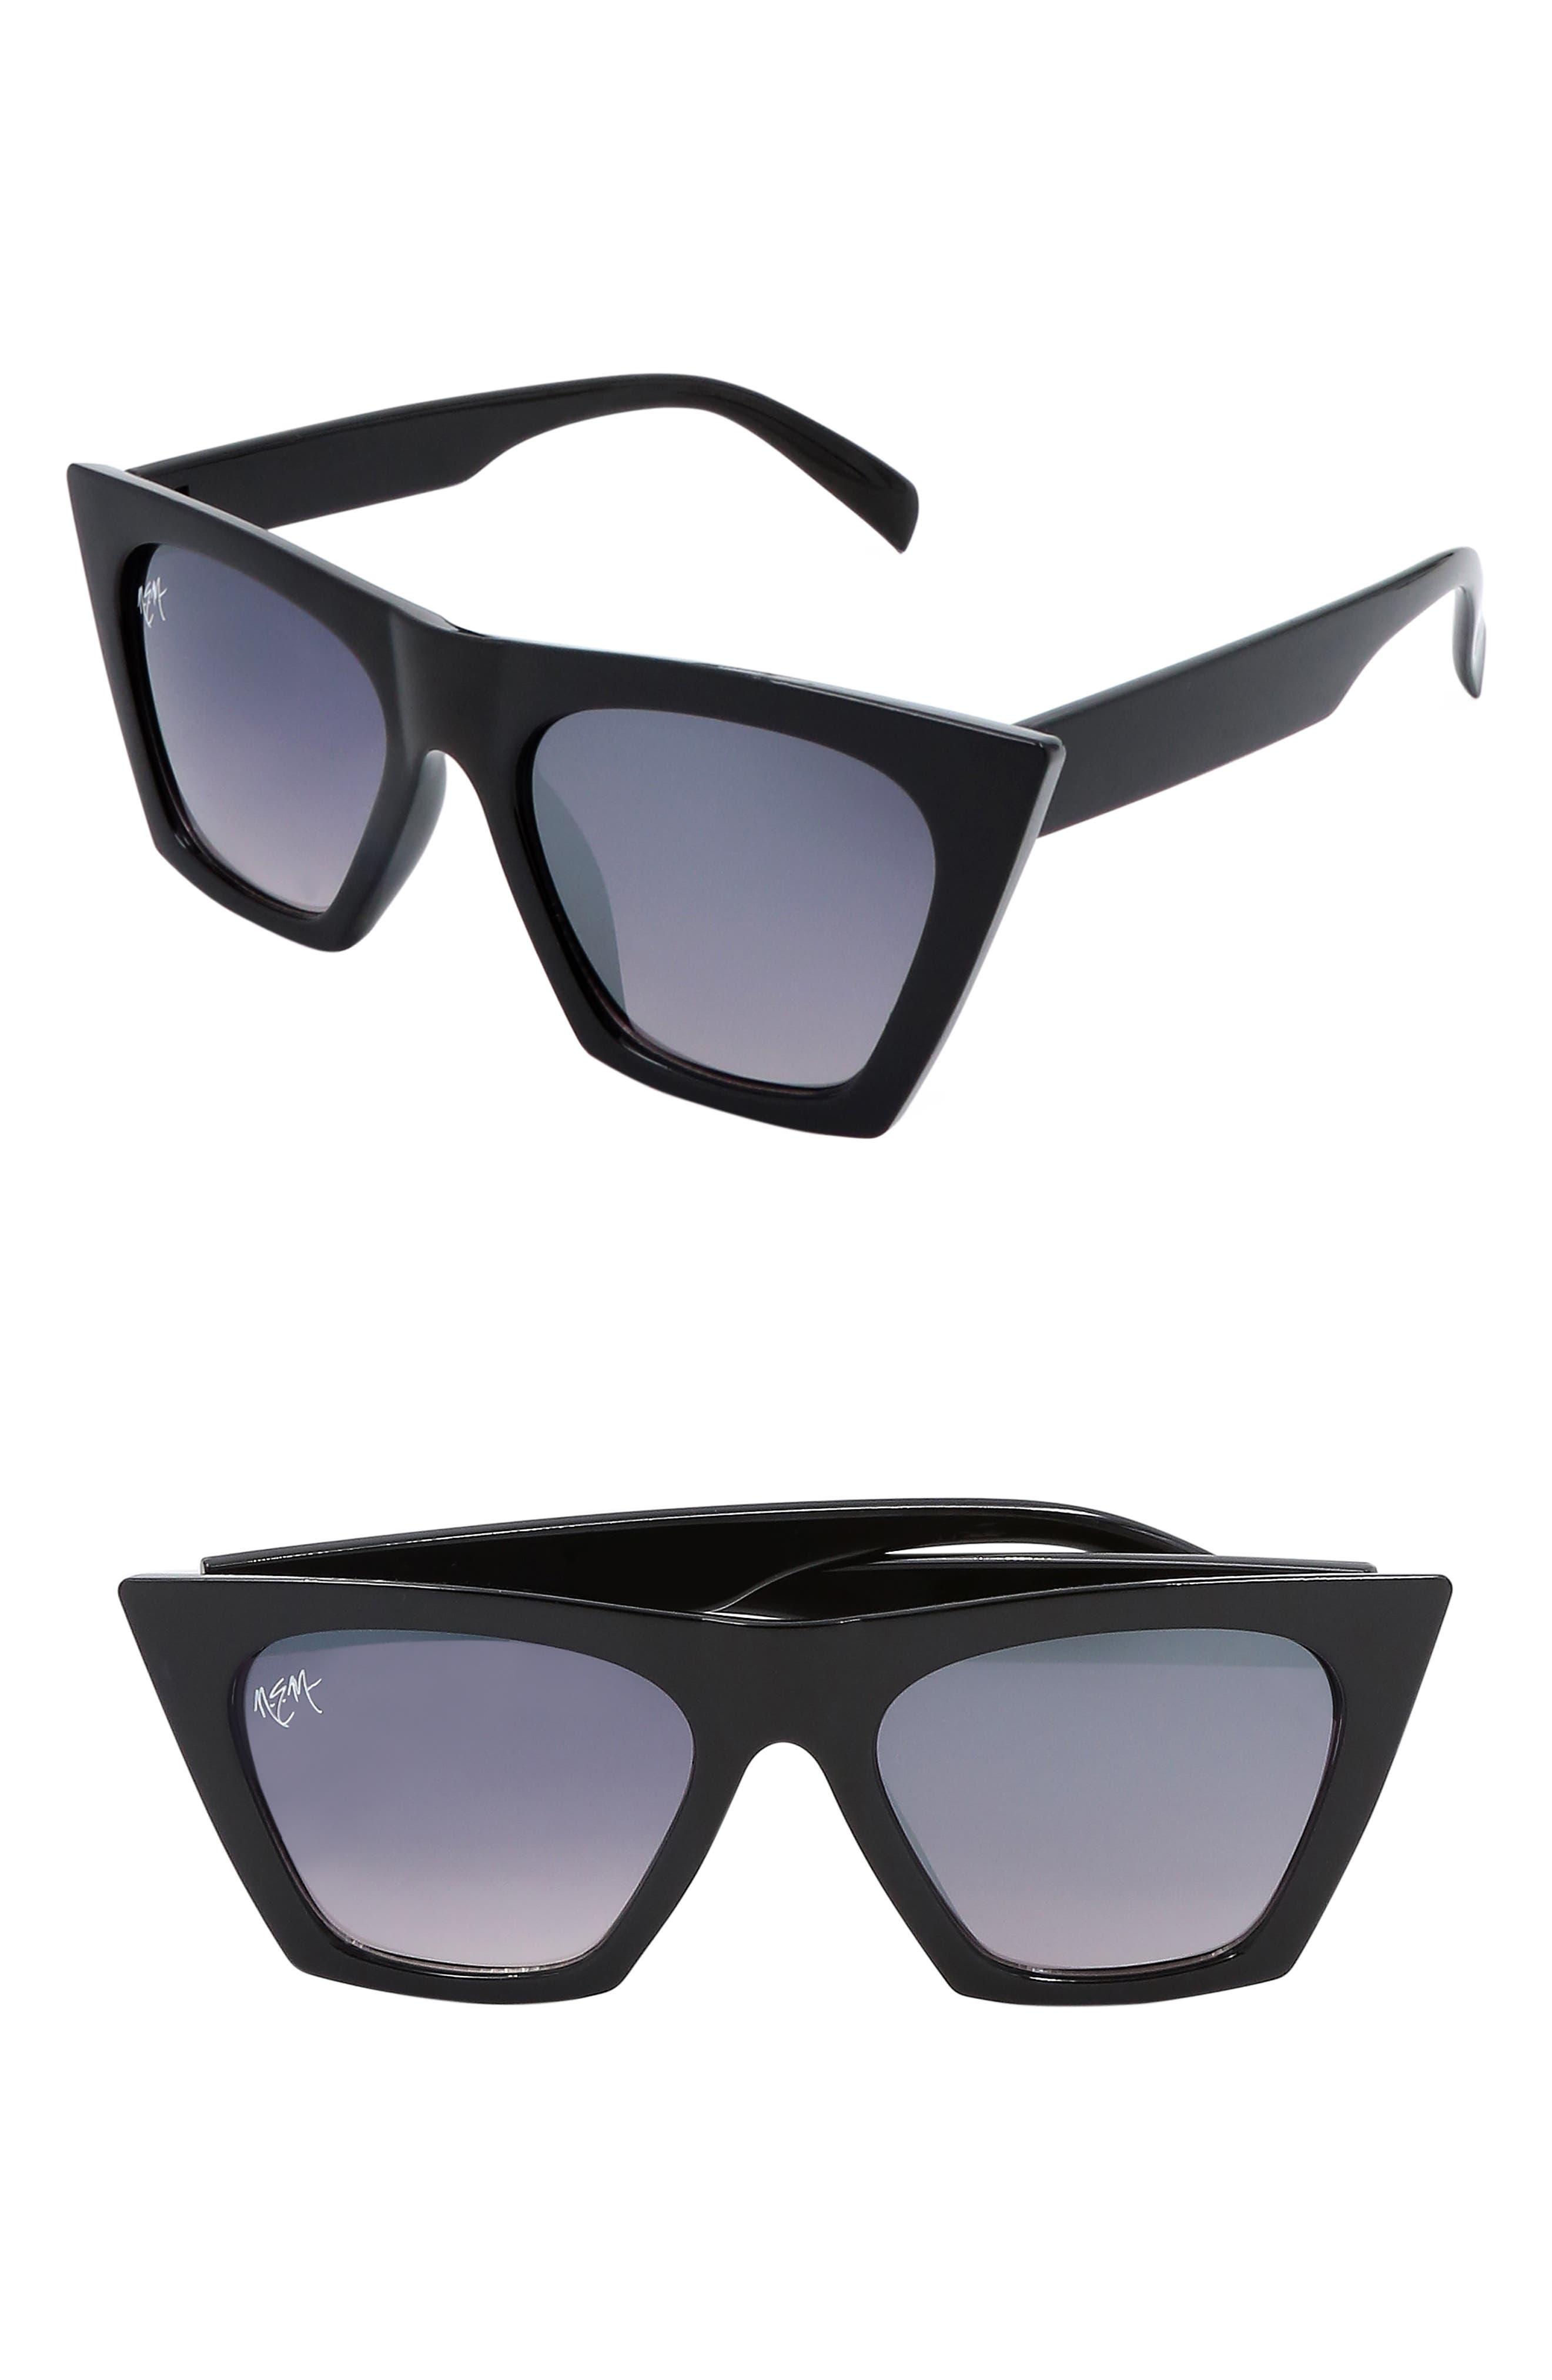 Posh 50mm Gradient Angular Sunglasses,                             Main thumbnail 1, color,                             BLACK W GREY GRADIENT LENS